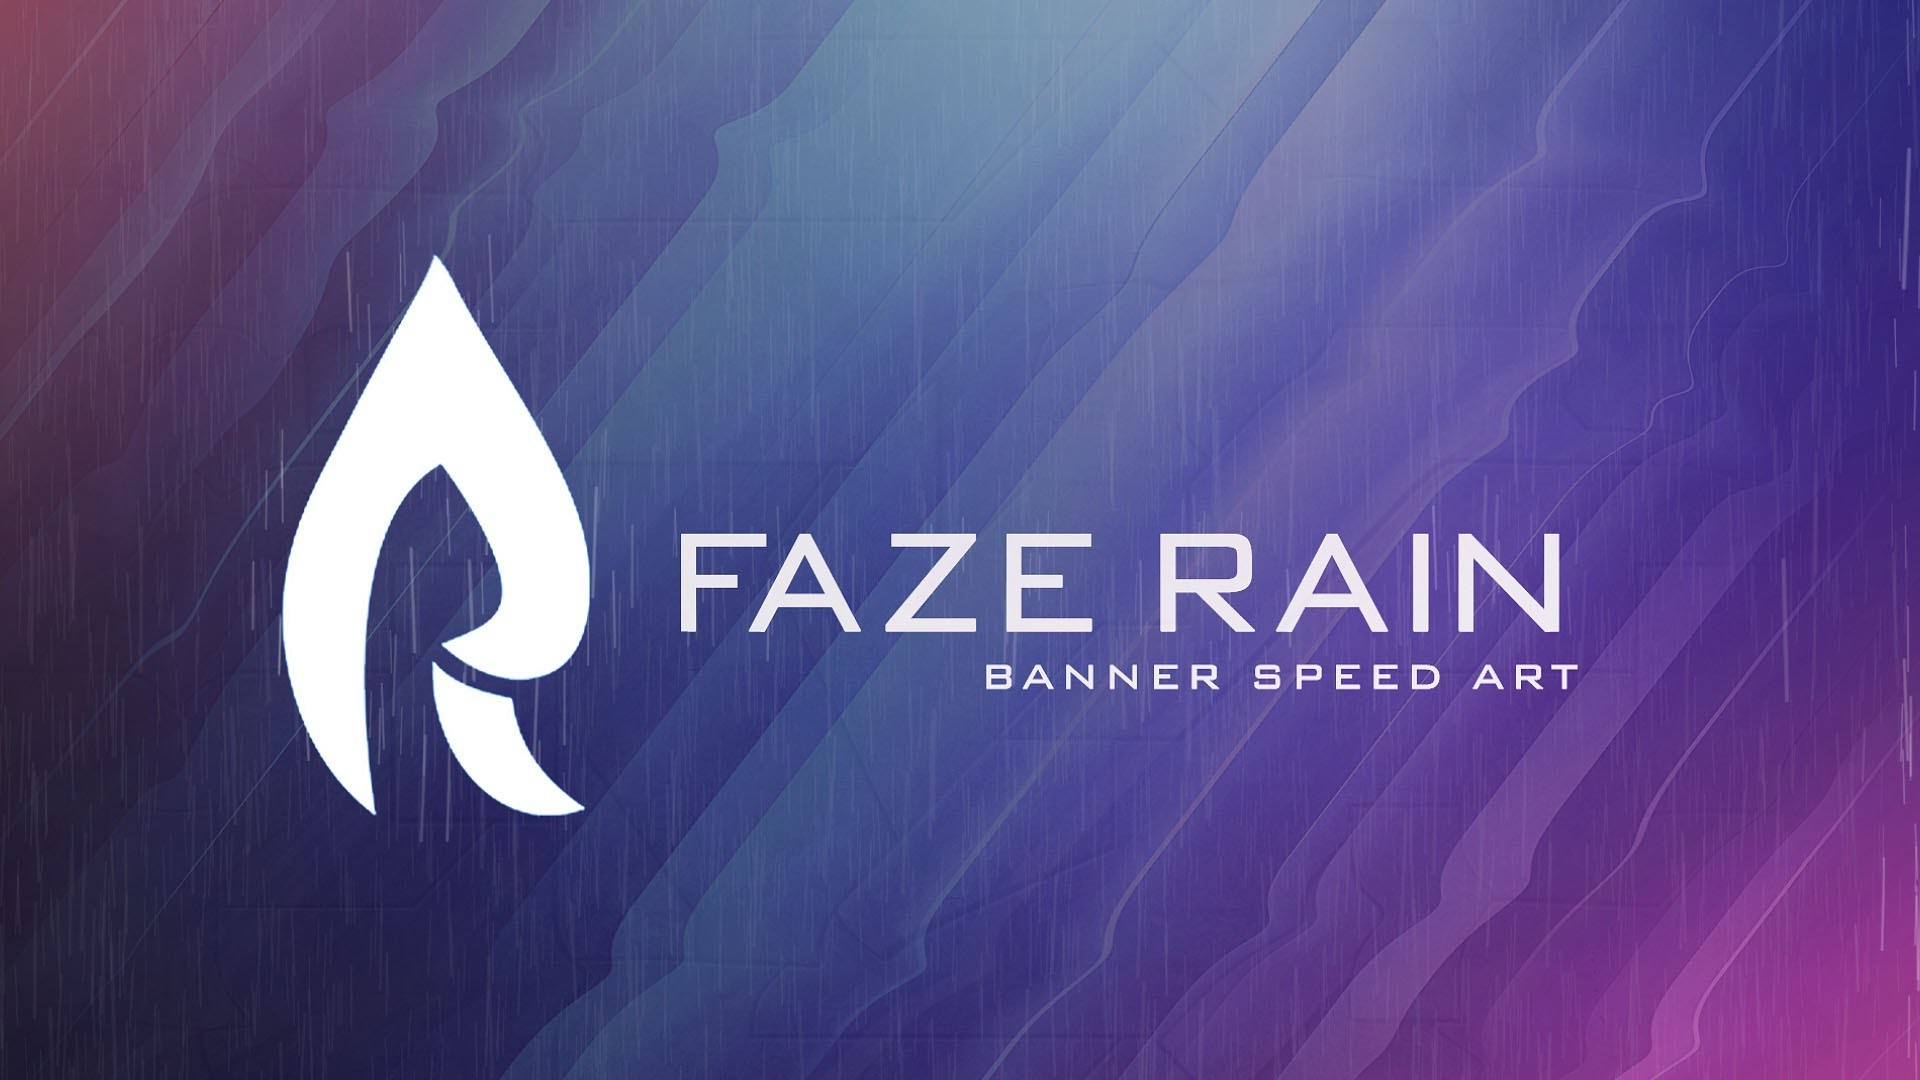 Wallpaper for Desktop: FaZe Rain